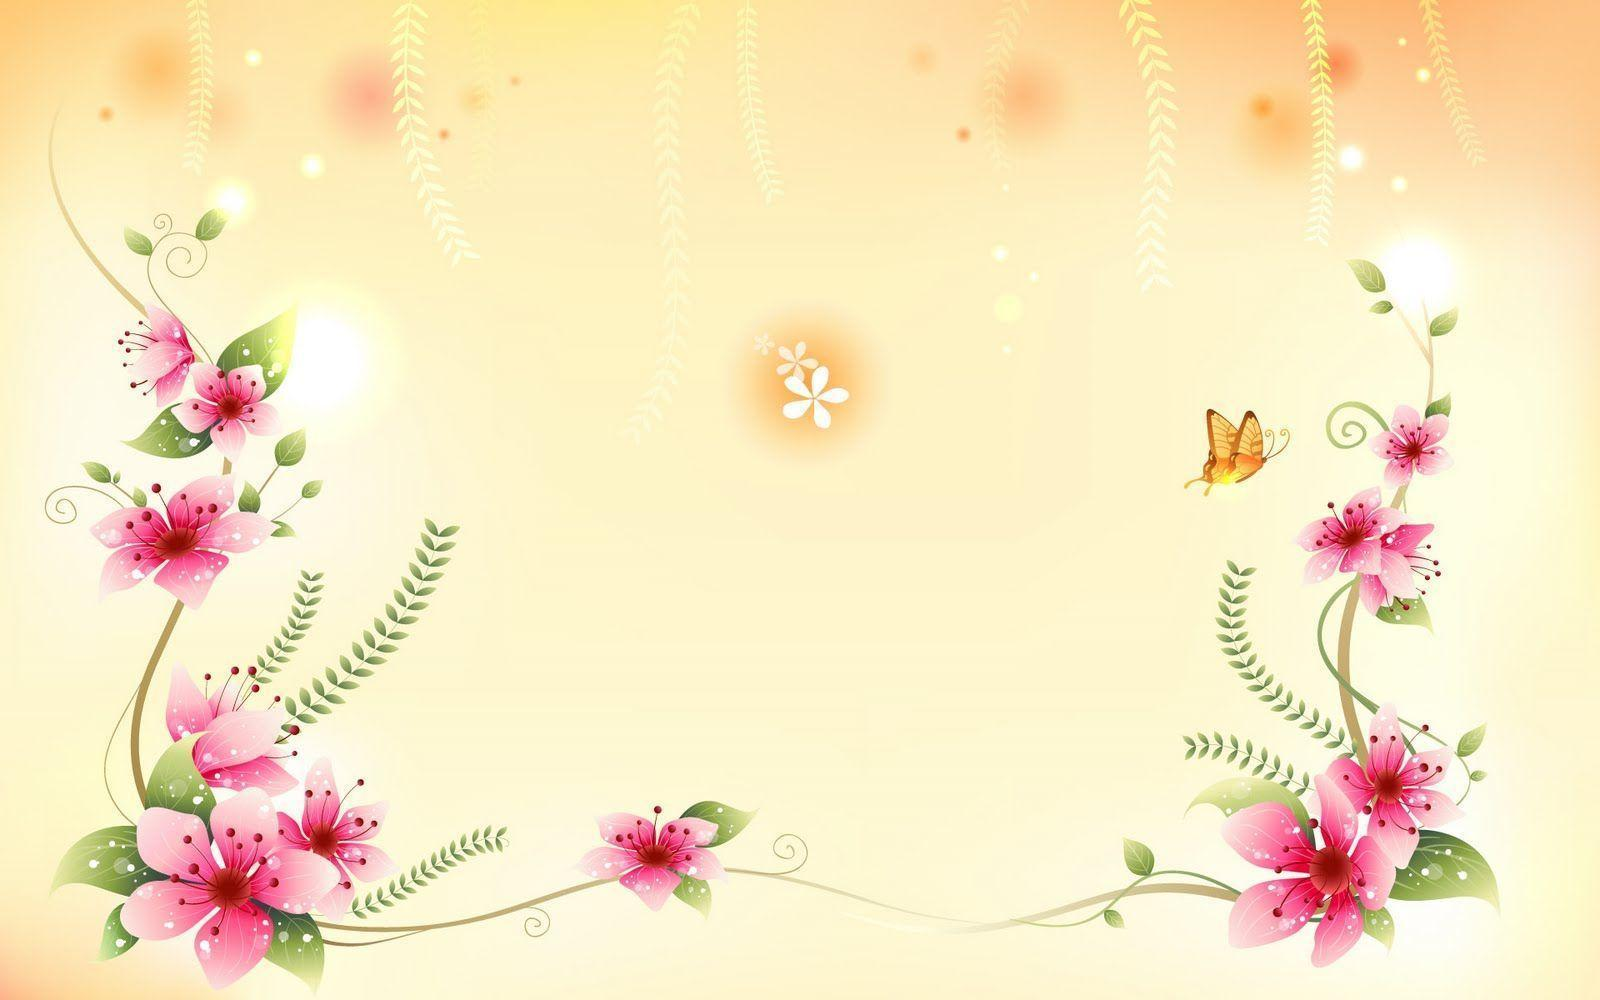 Flower Image Backgrounds - Wallpaper Cave